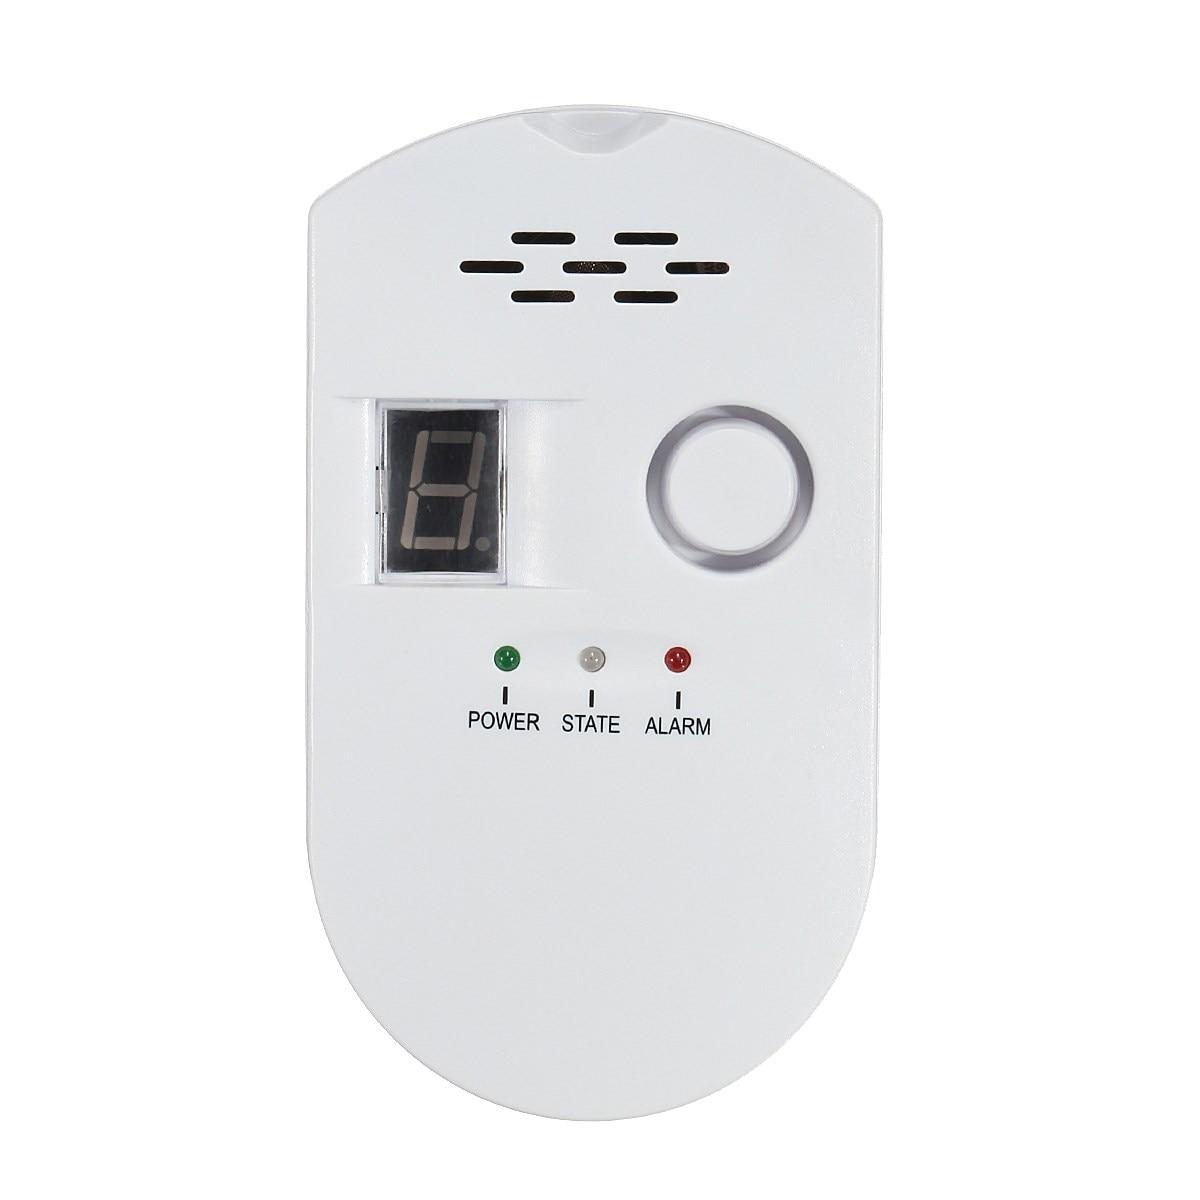 NEW Safurance LCD LPG LNG Coal Natural Gas Leak Security Alarm Sensor Warning Detector UK Plug High Sensitive недорого